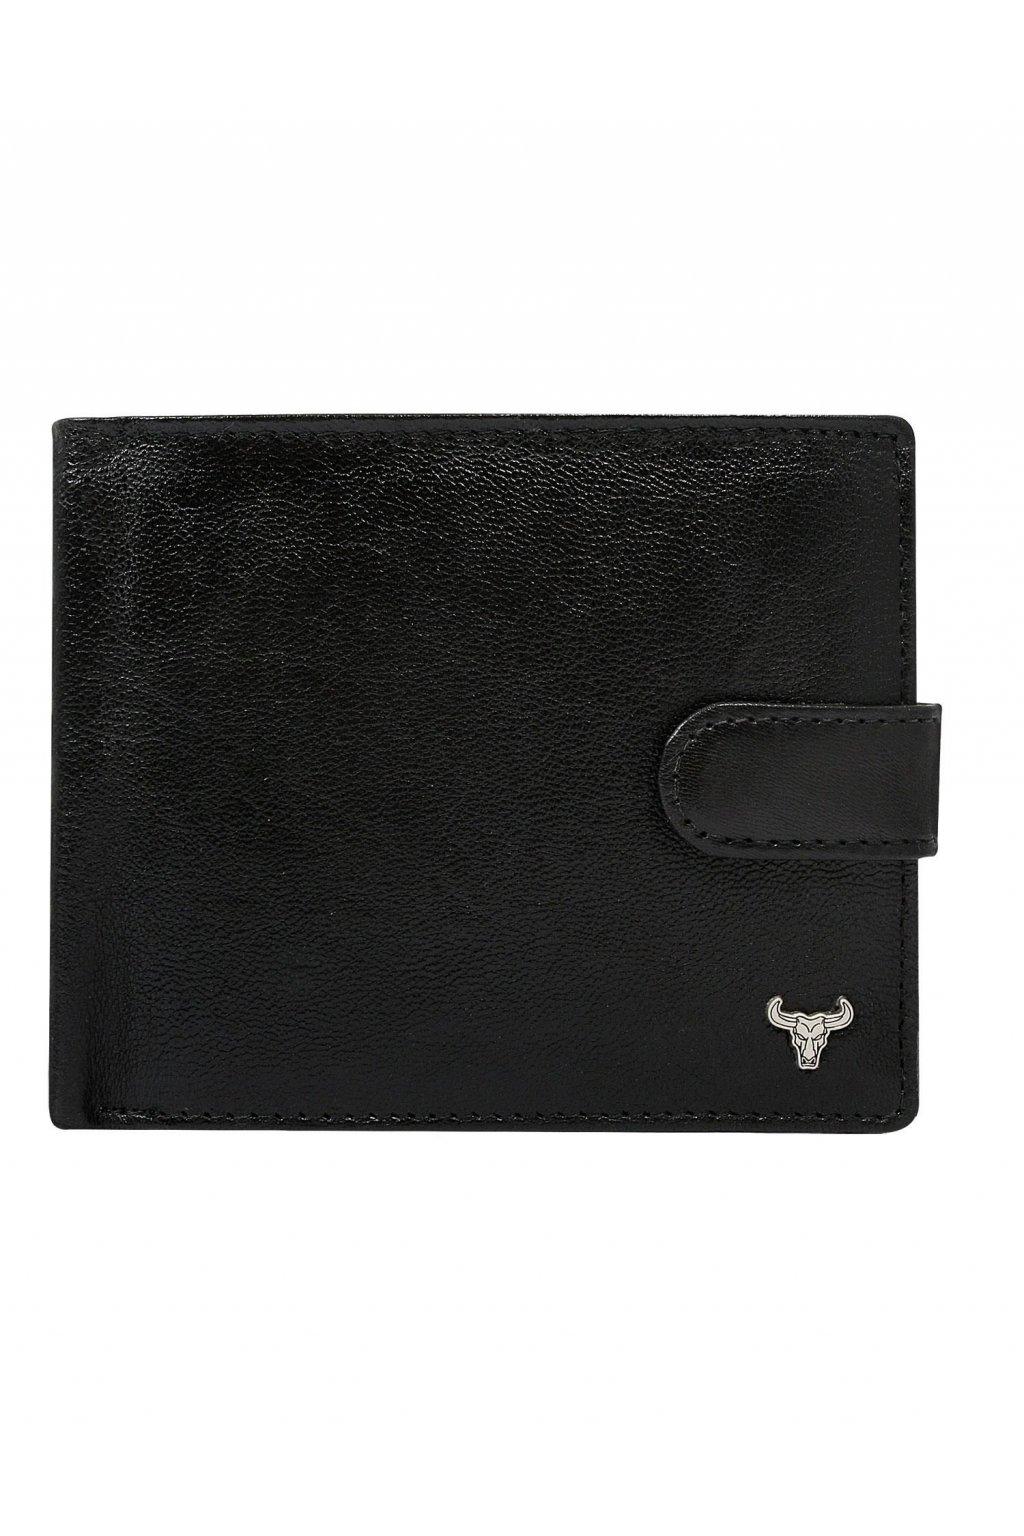 Pánska peňaženka kód CE-PF-N992L-BW.73